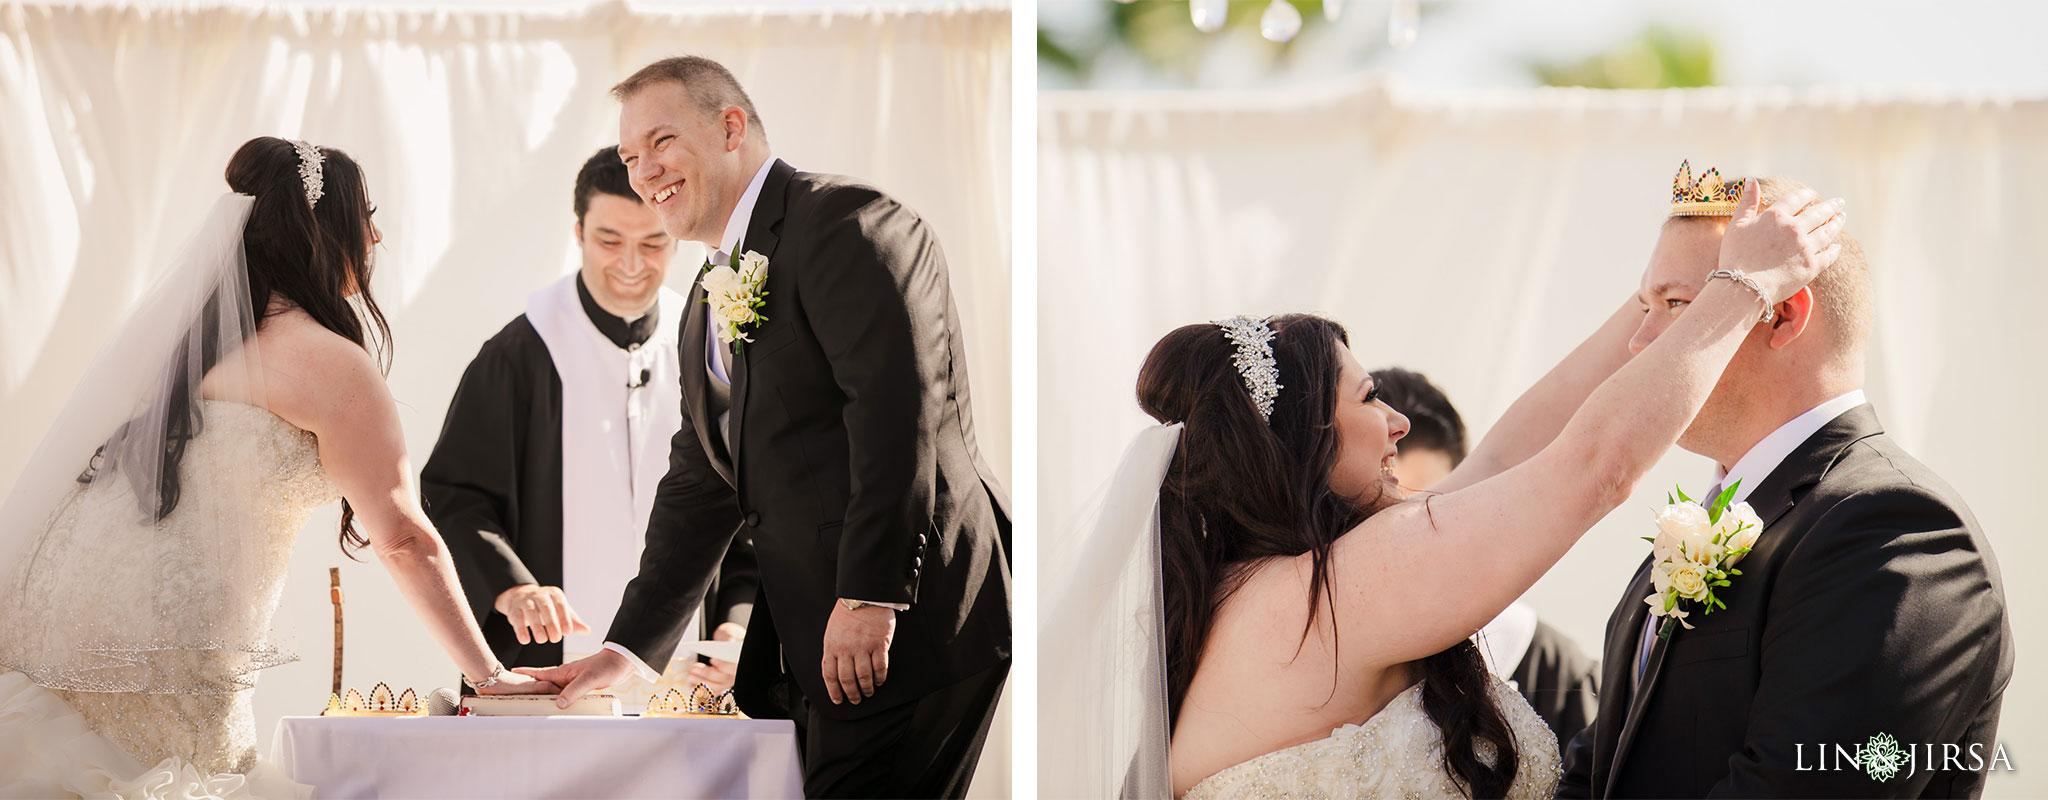 19 hilton waterfront beach resort wedding photography